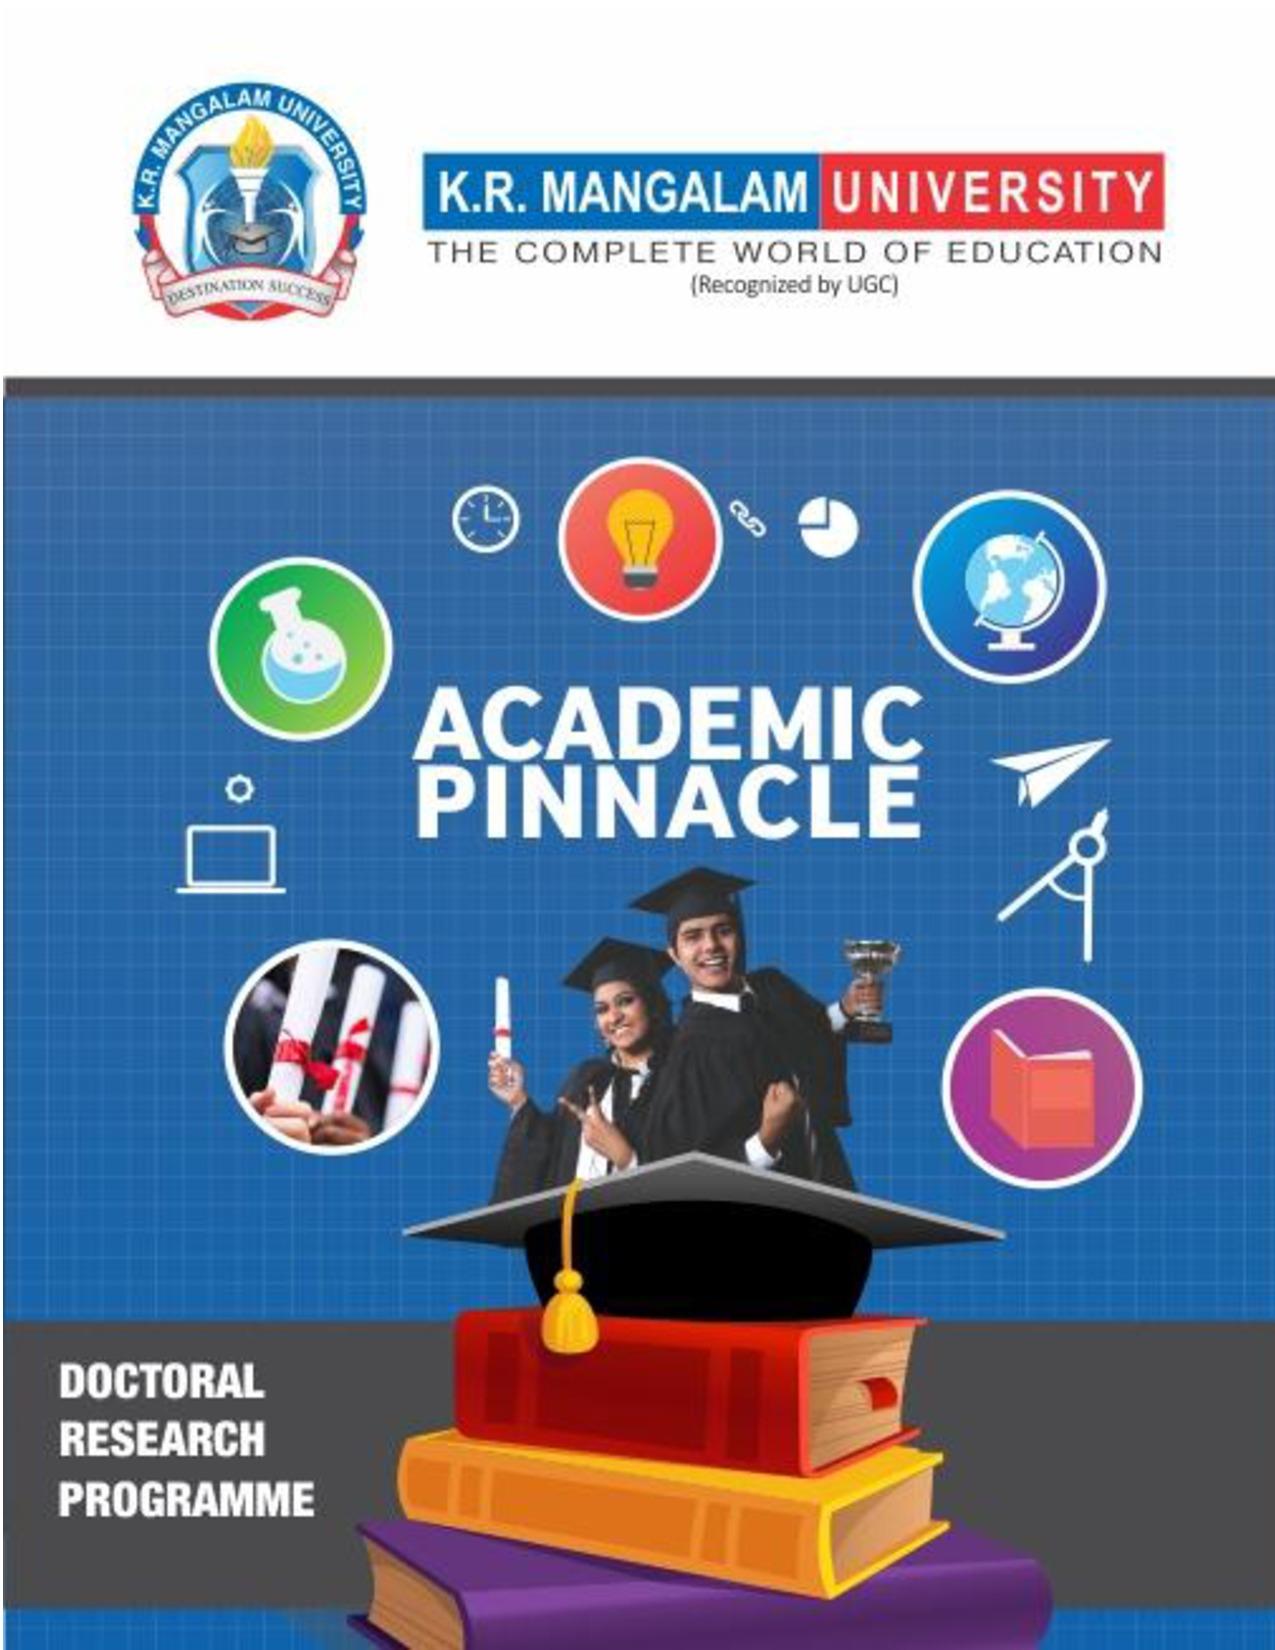 K.R. Mangalam University Admission Courses BA MA BBA B.Com M.Com Pharmacy